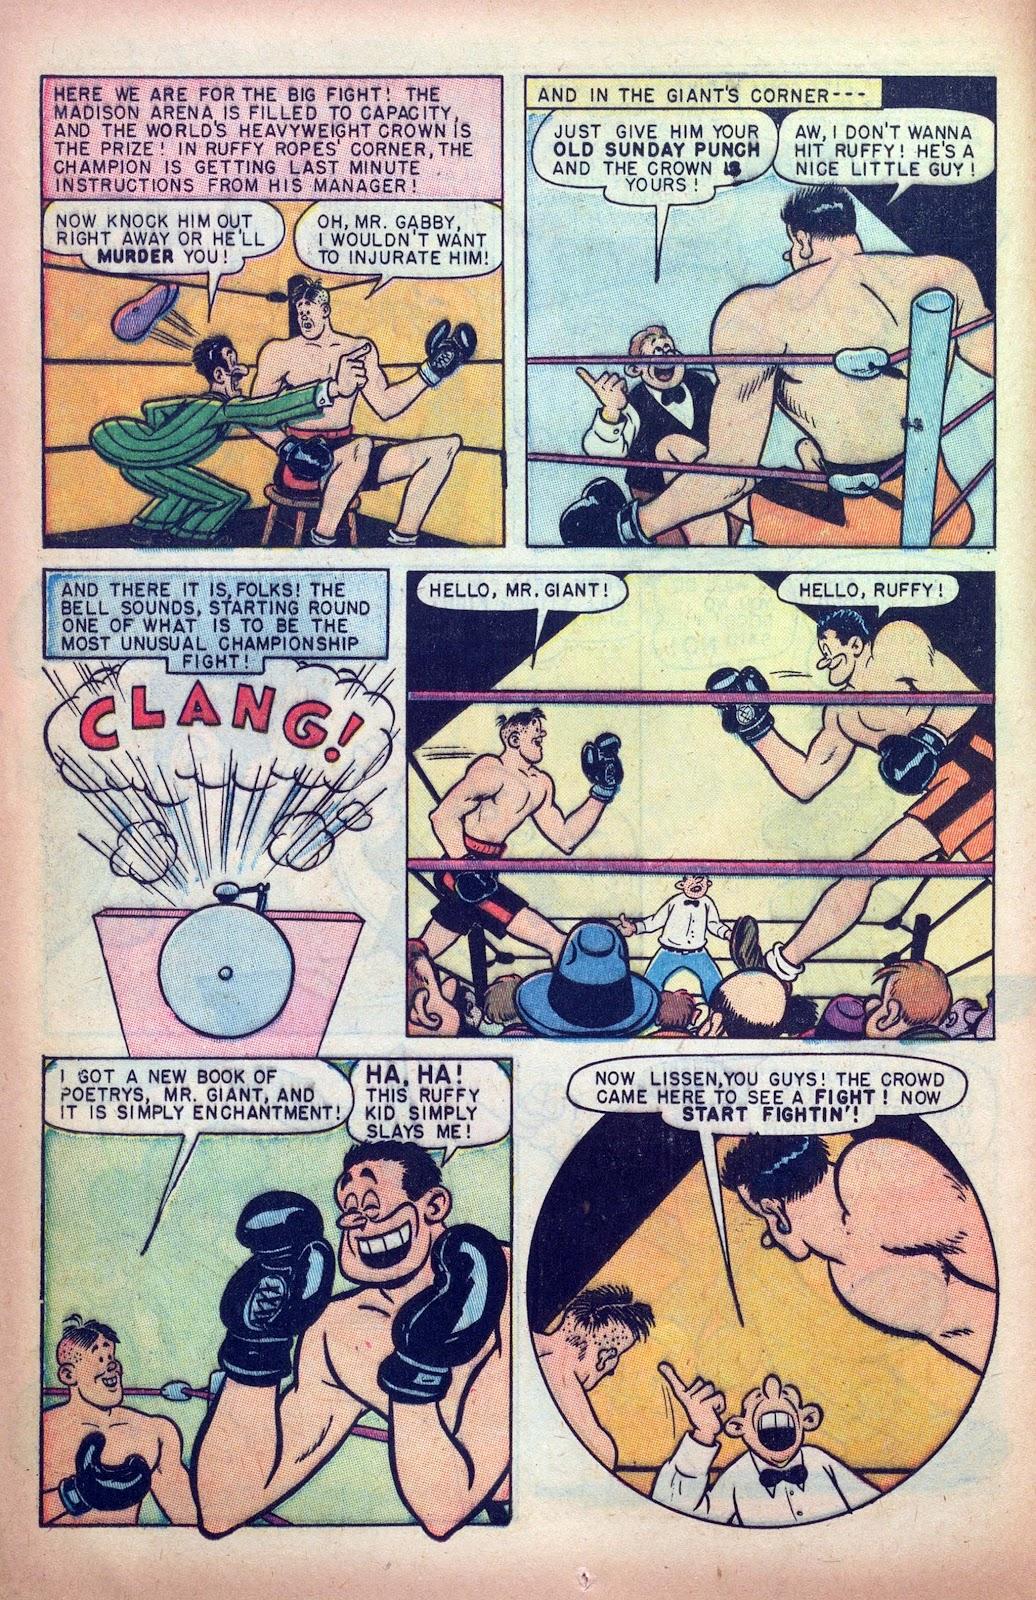 Read online Joker Comics comic -  Issue #27 - 16